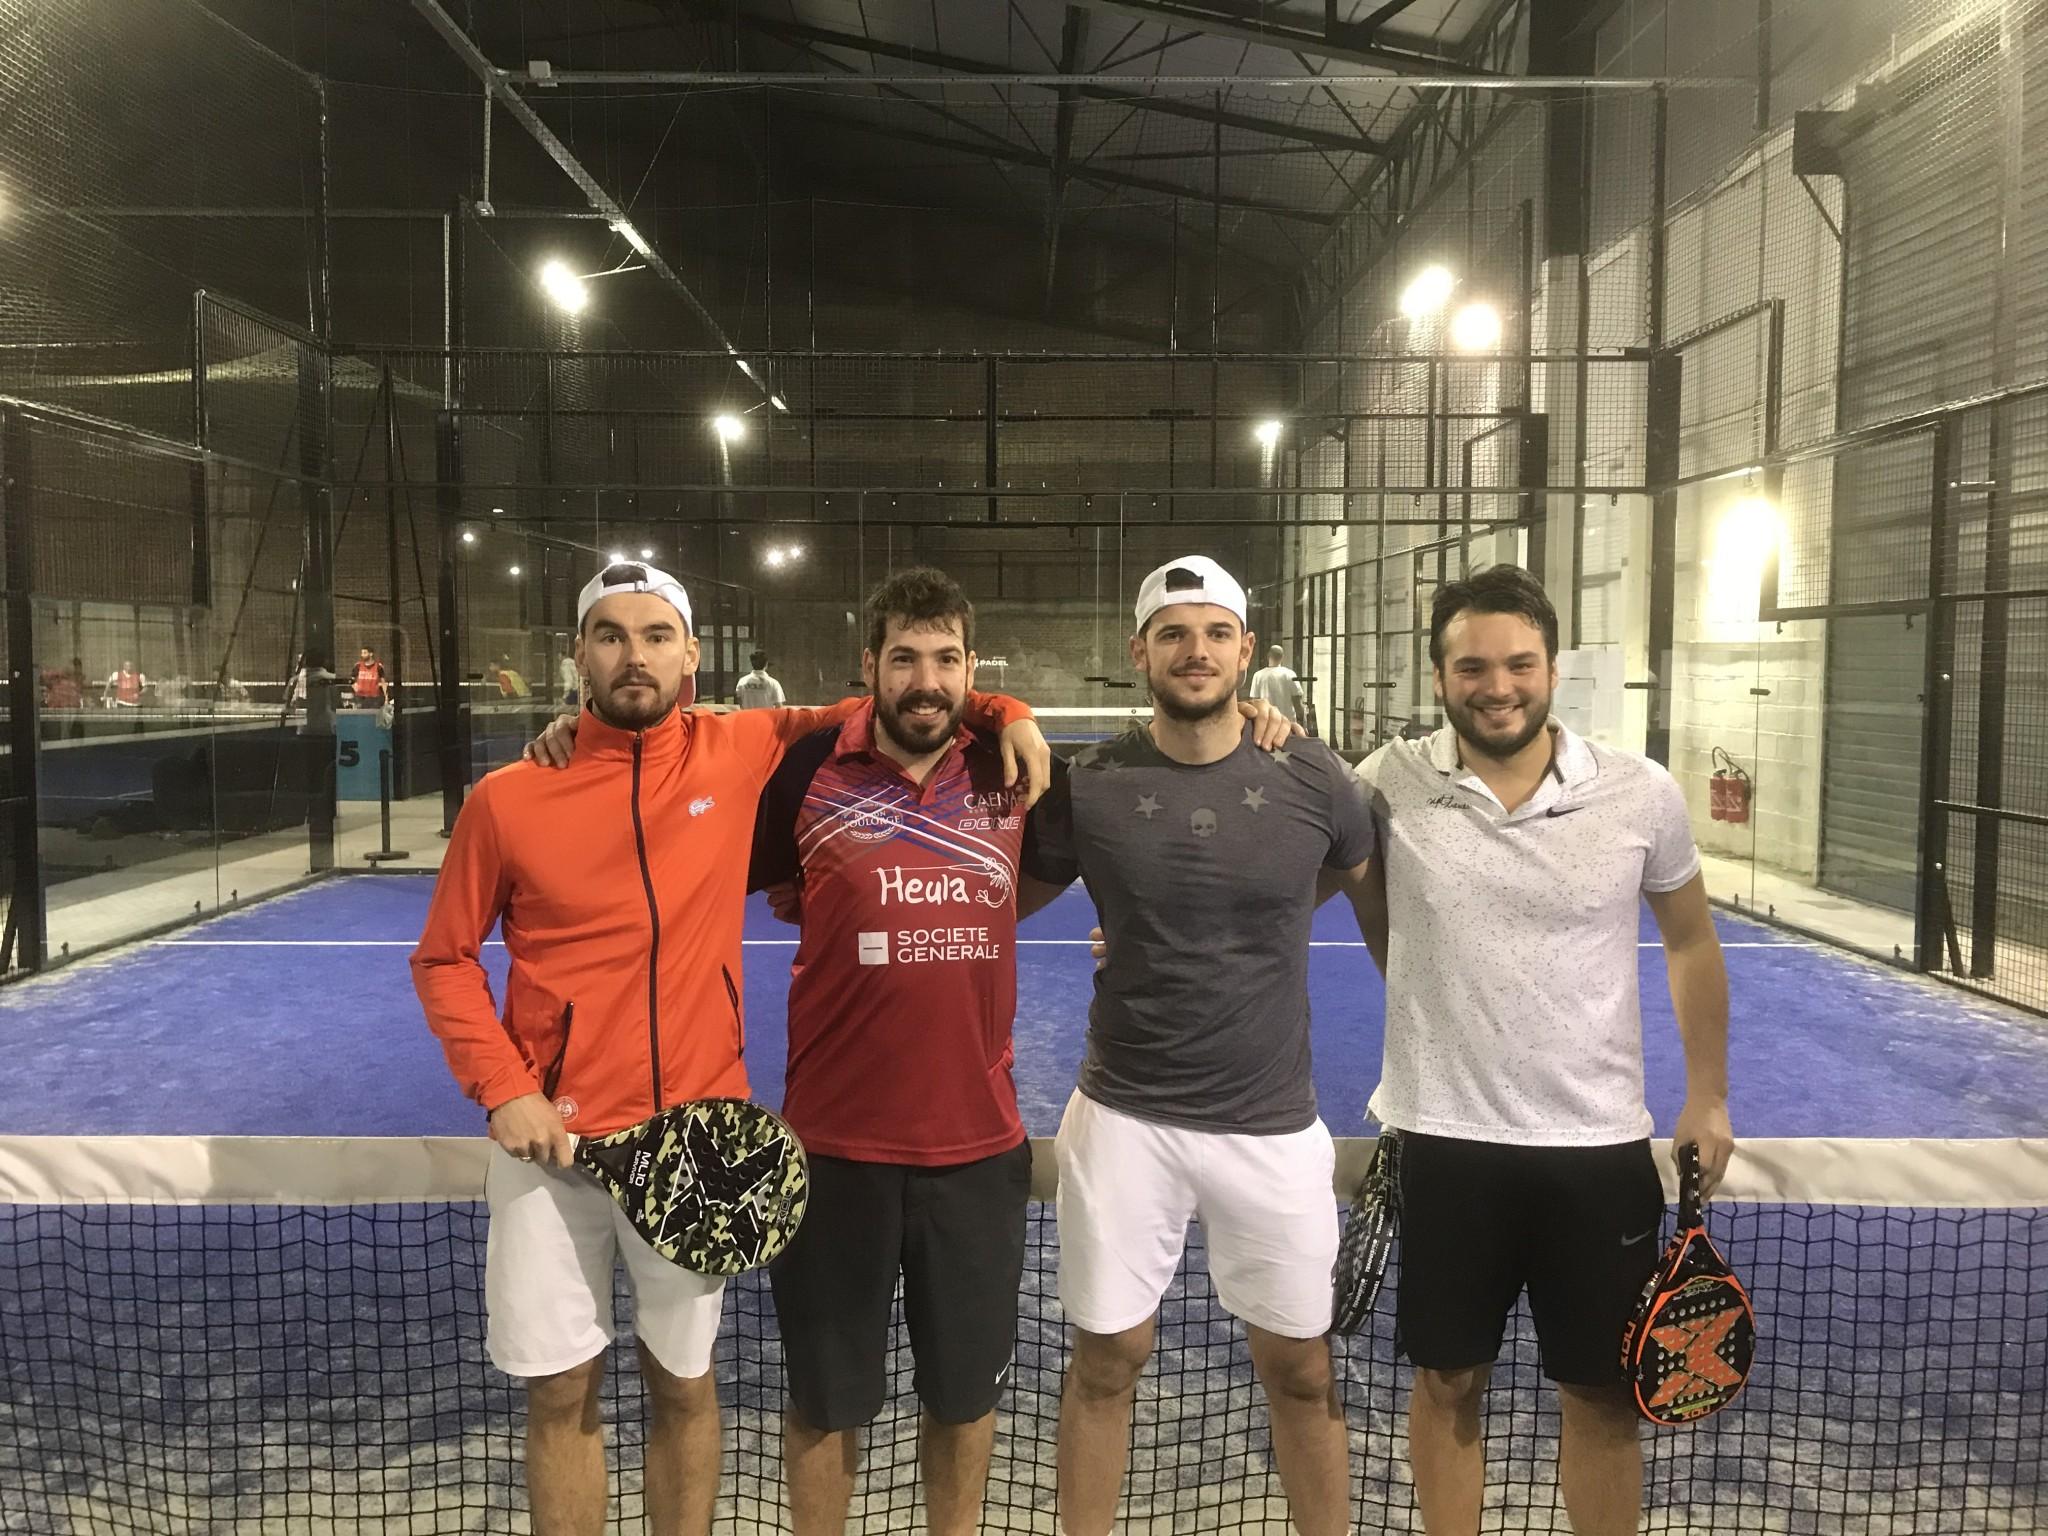 Béziers Padel Klubb och 4Padel Rouen i turneringsläge!